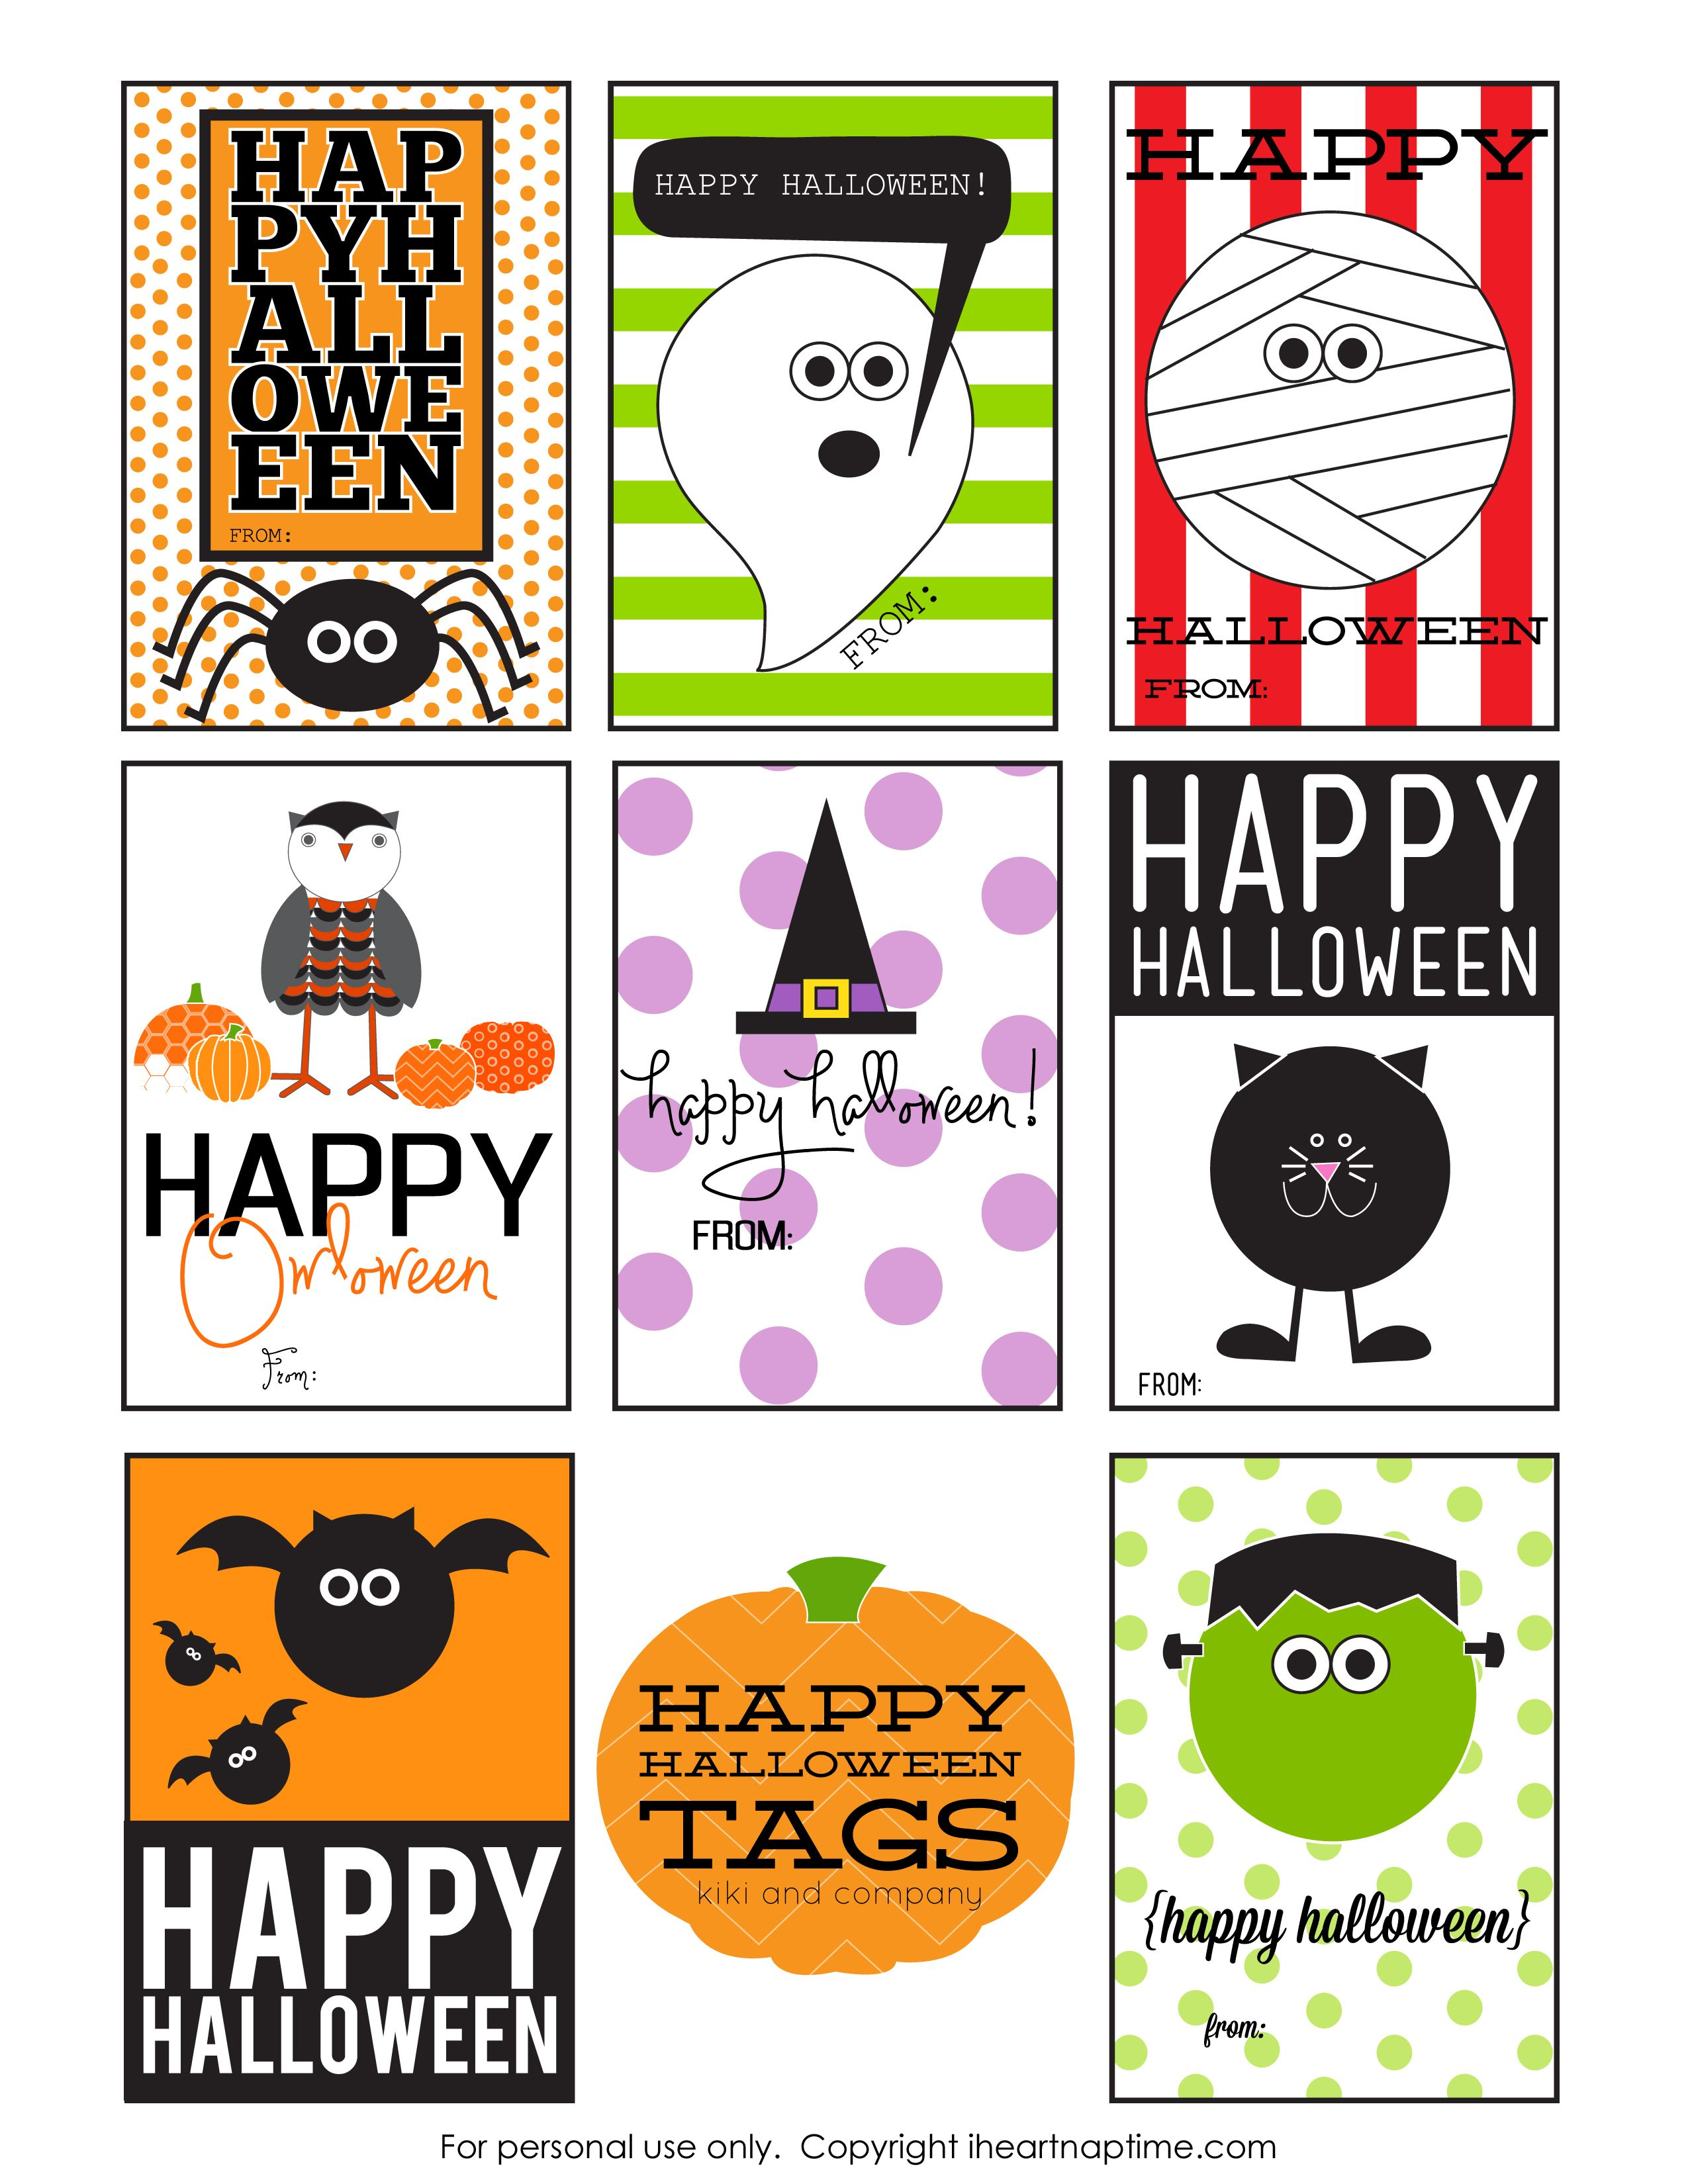 halloween-tags-copy.jpg 2.550×3.300 pixels